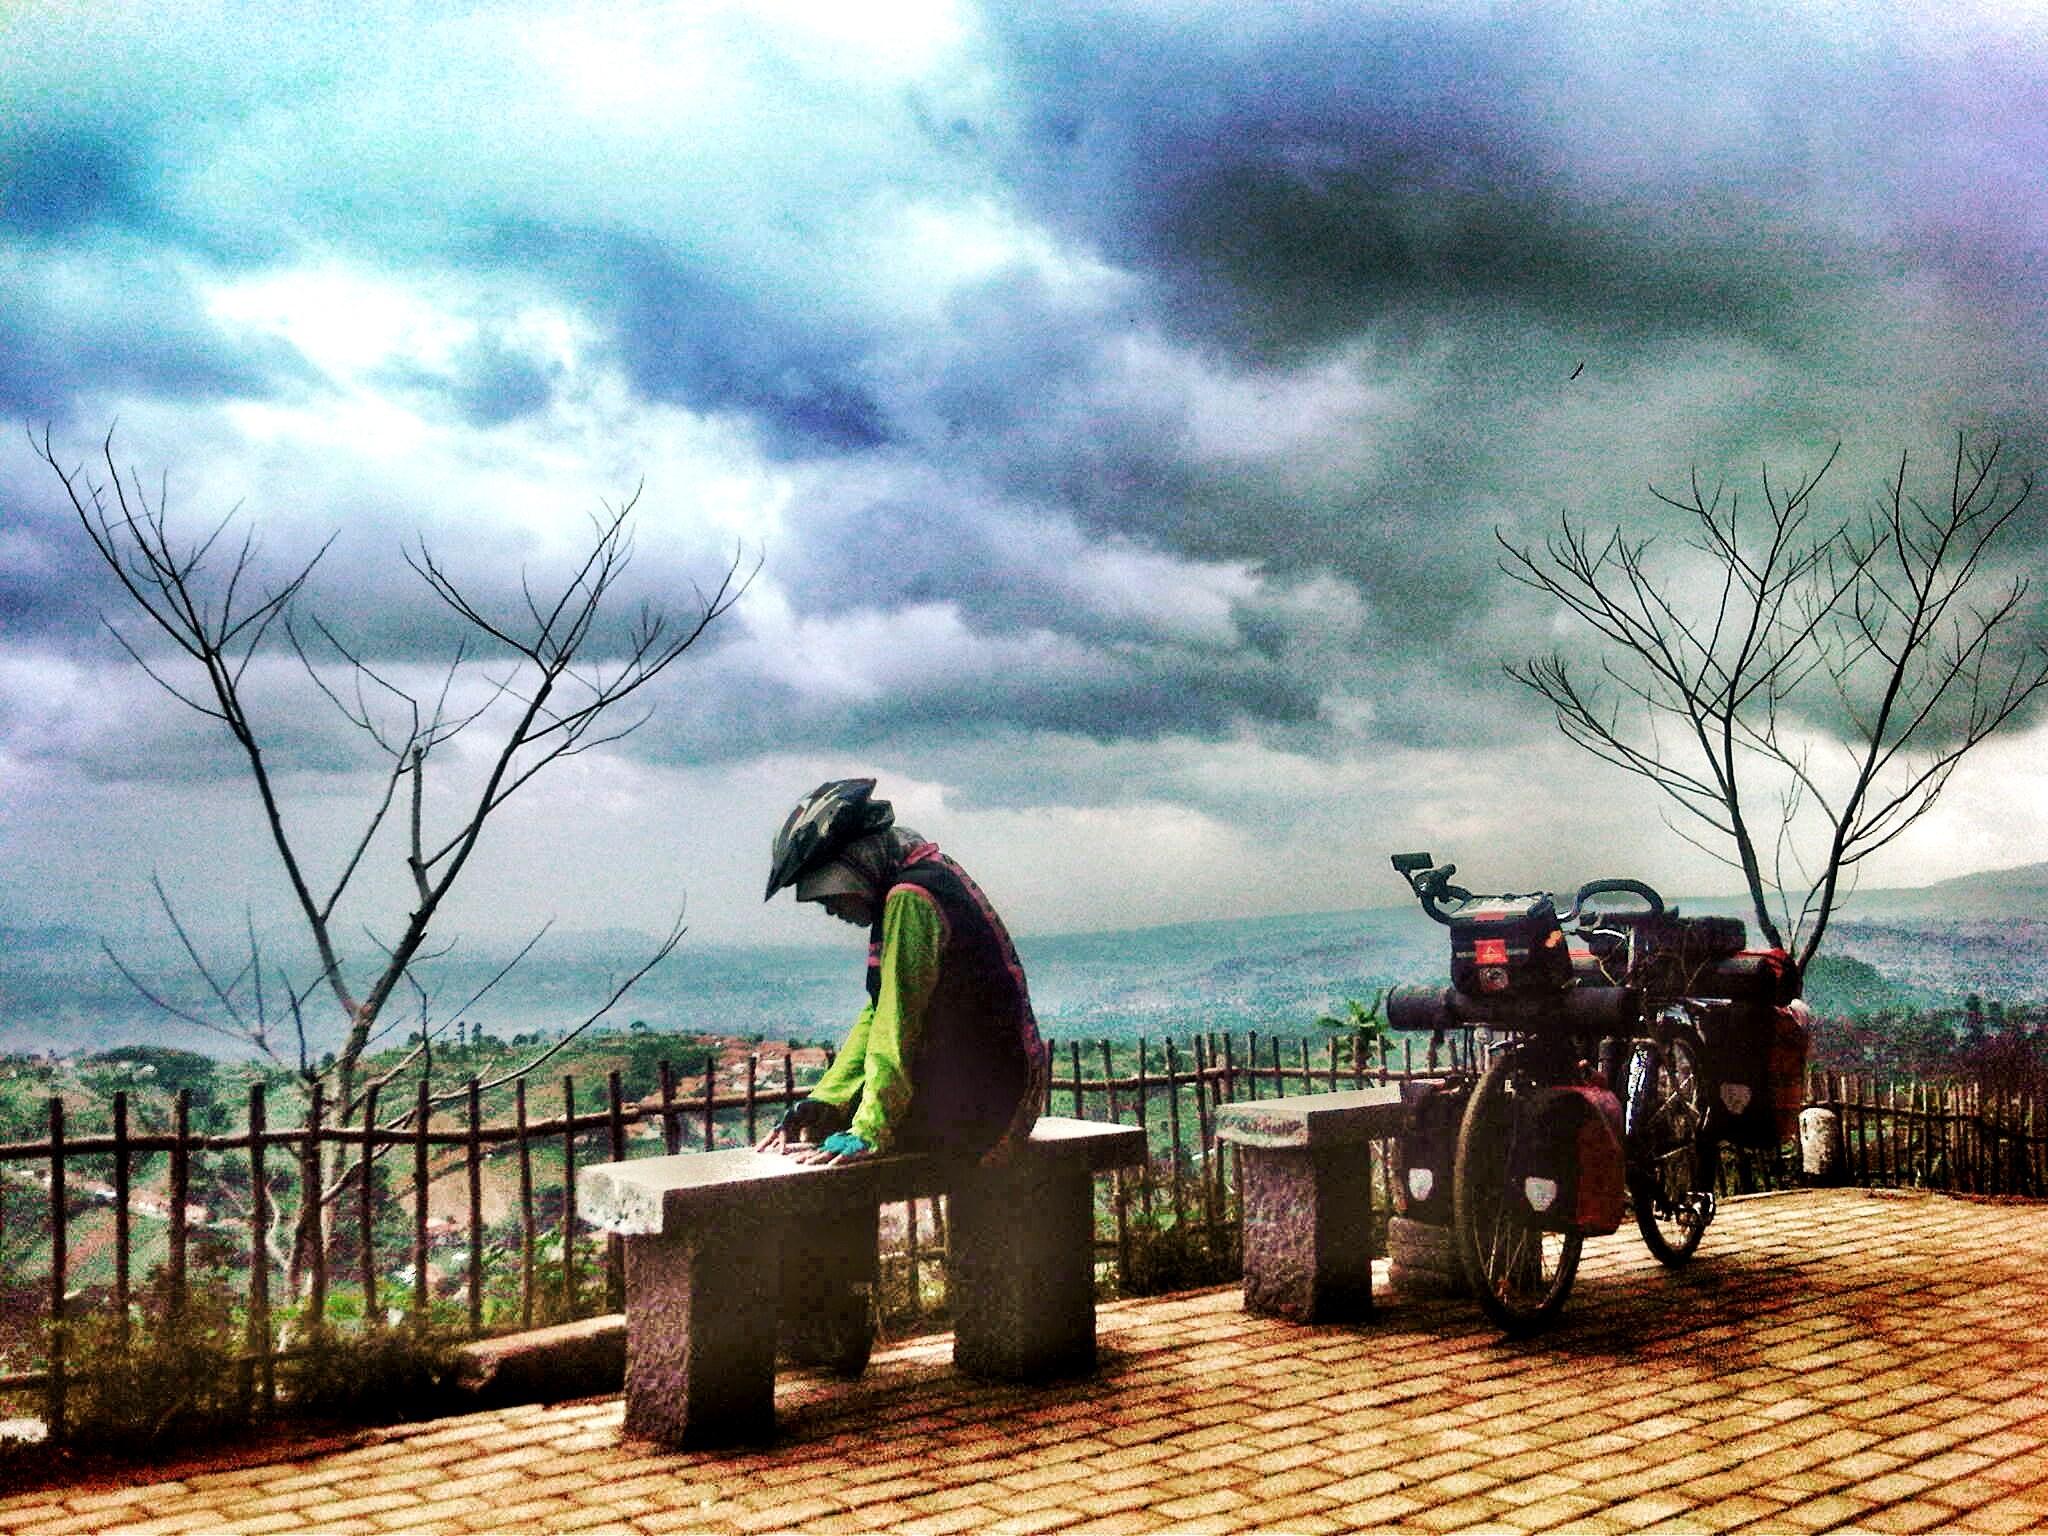 Bintang Puncak Hidup Udunan Tempat Melihat Pemandangan Kota Bandung Warung